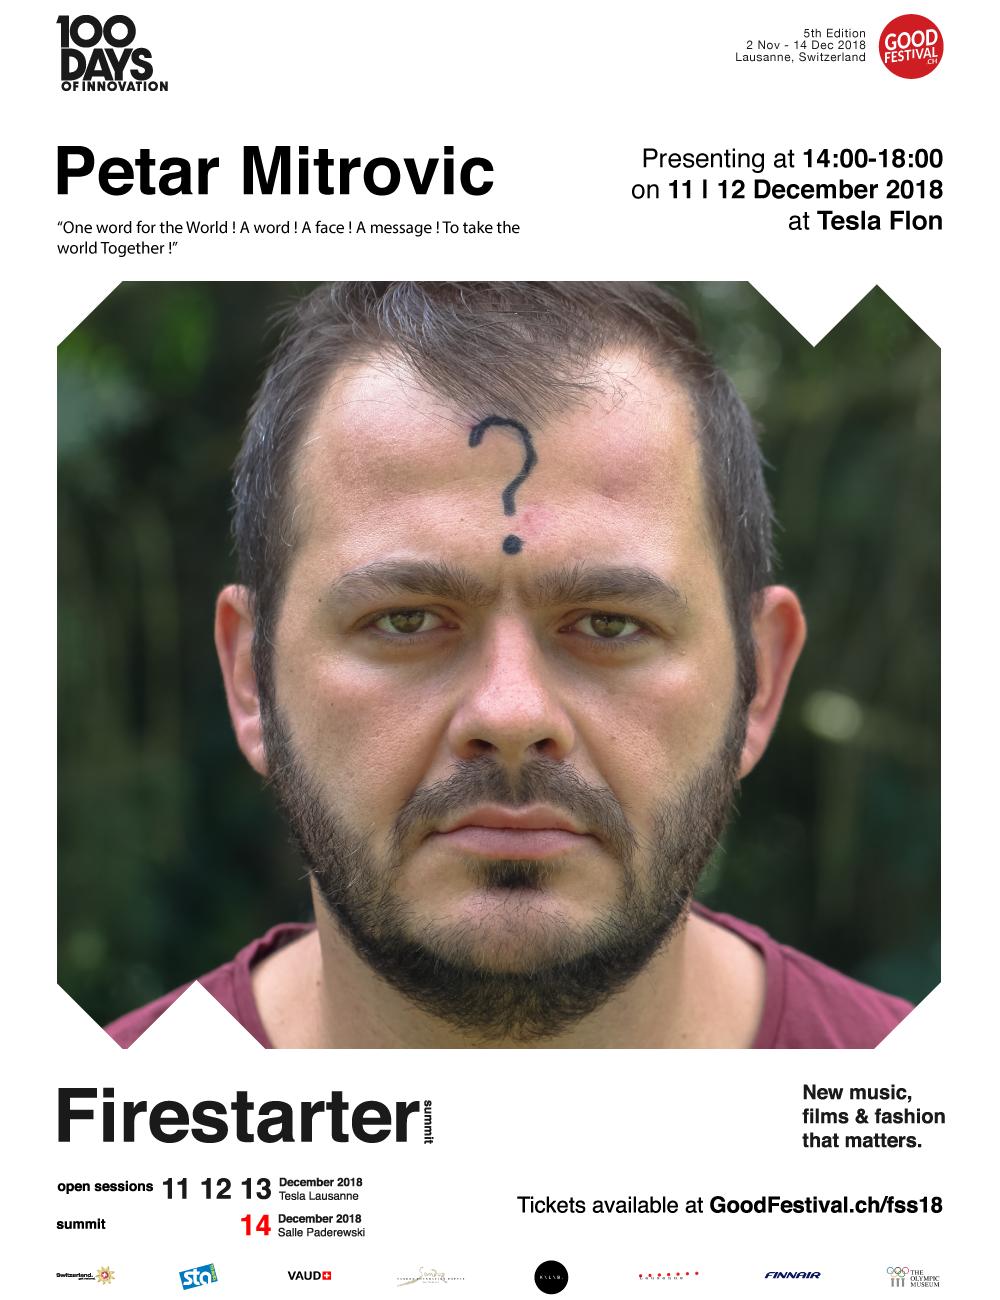 FSS-Artists-Posters-Petar-Mitrovic-.png